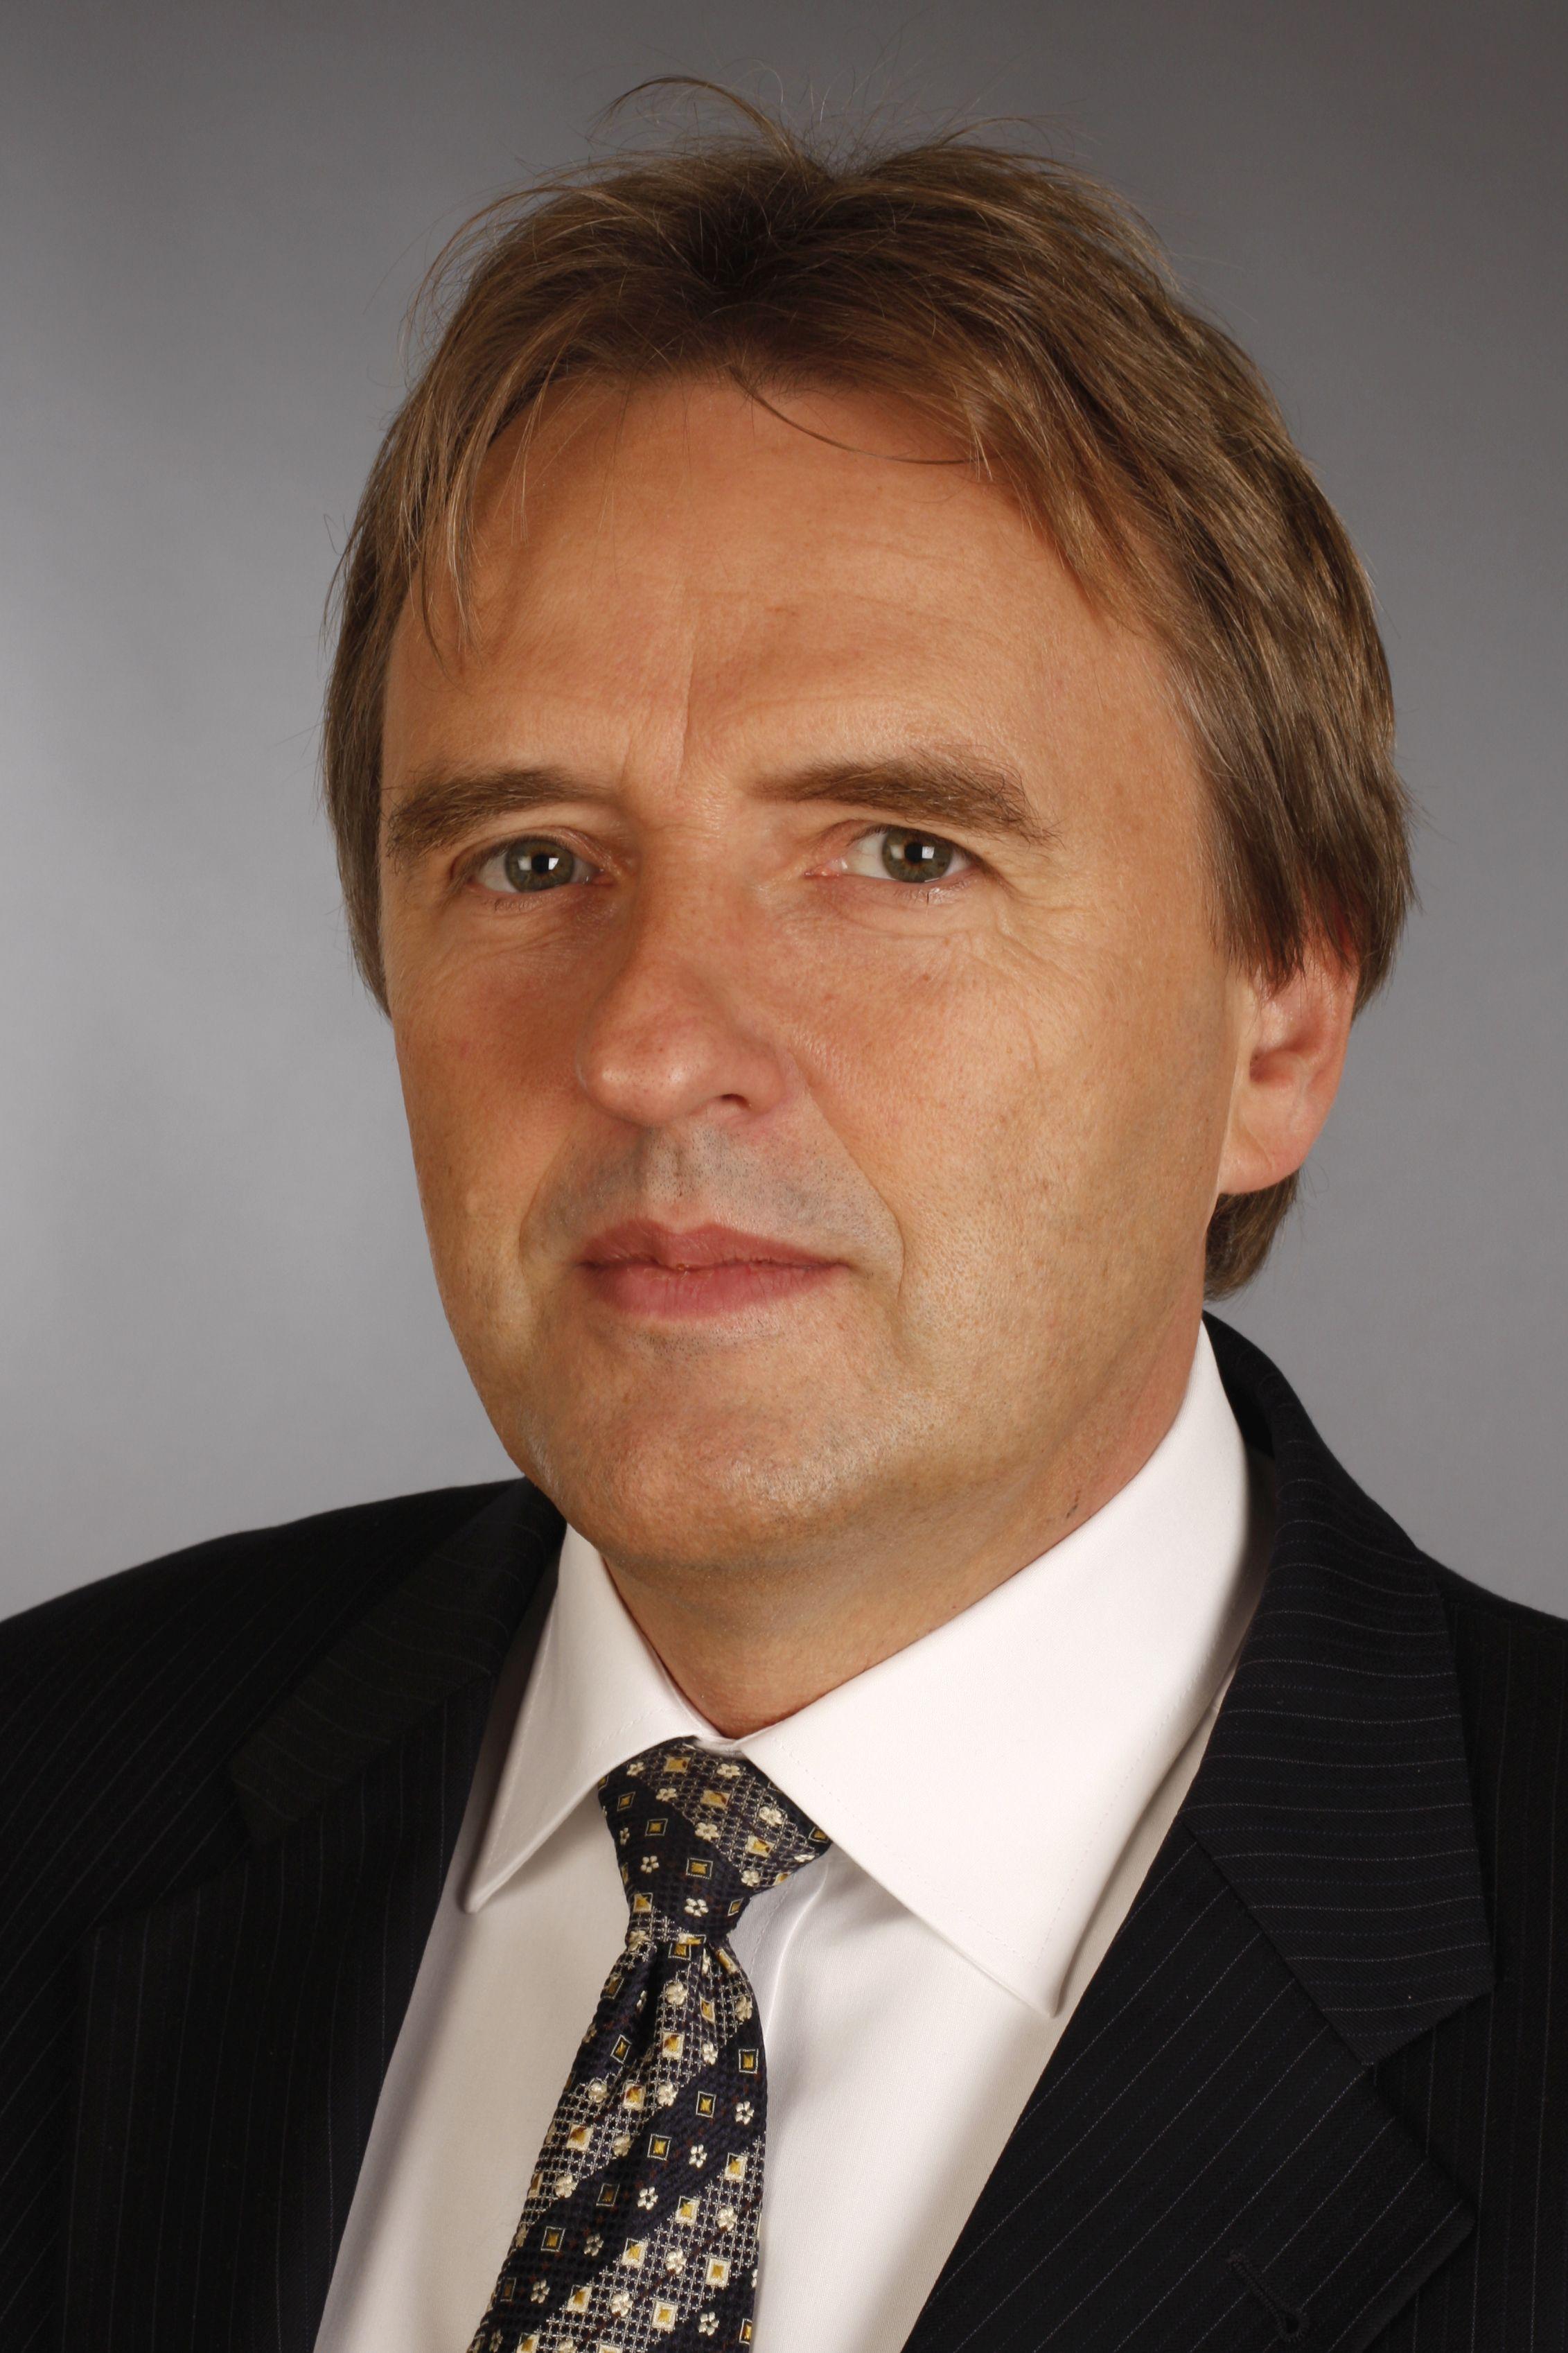 Portrait - 4 - Prof. Norbert Pohlmann